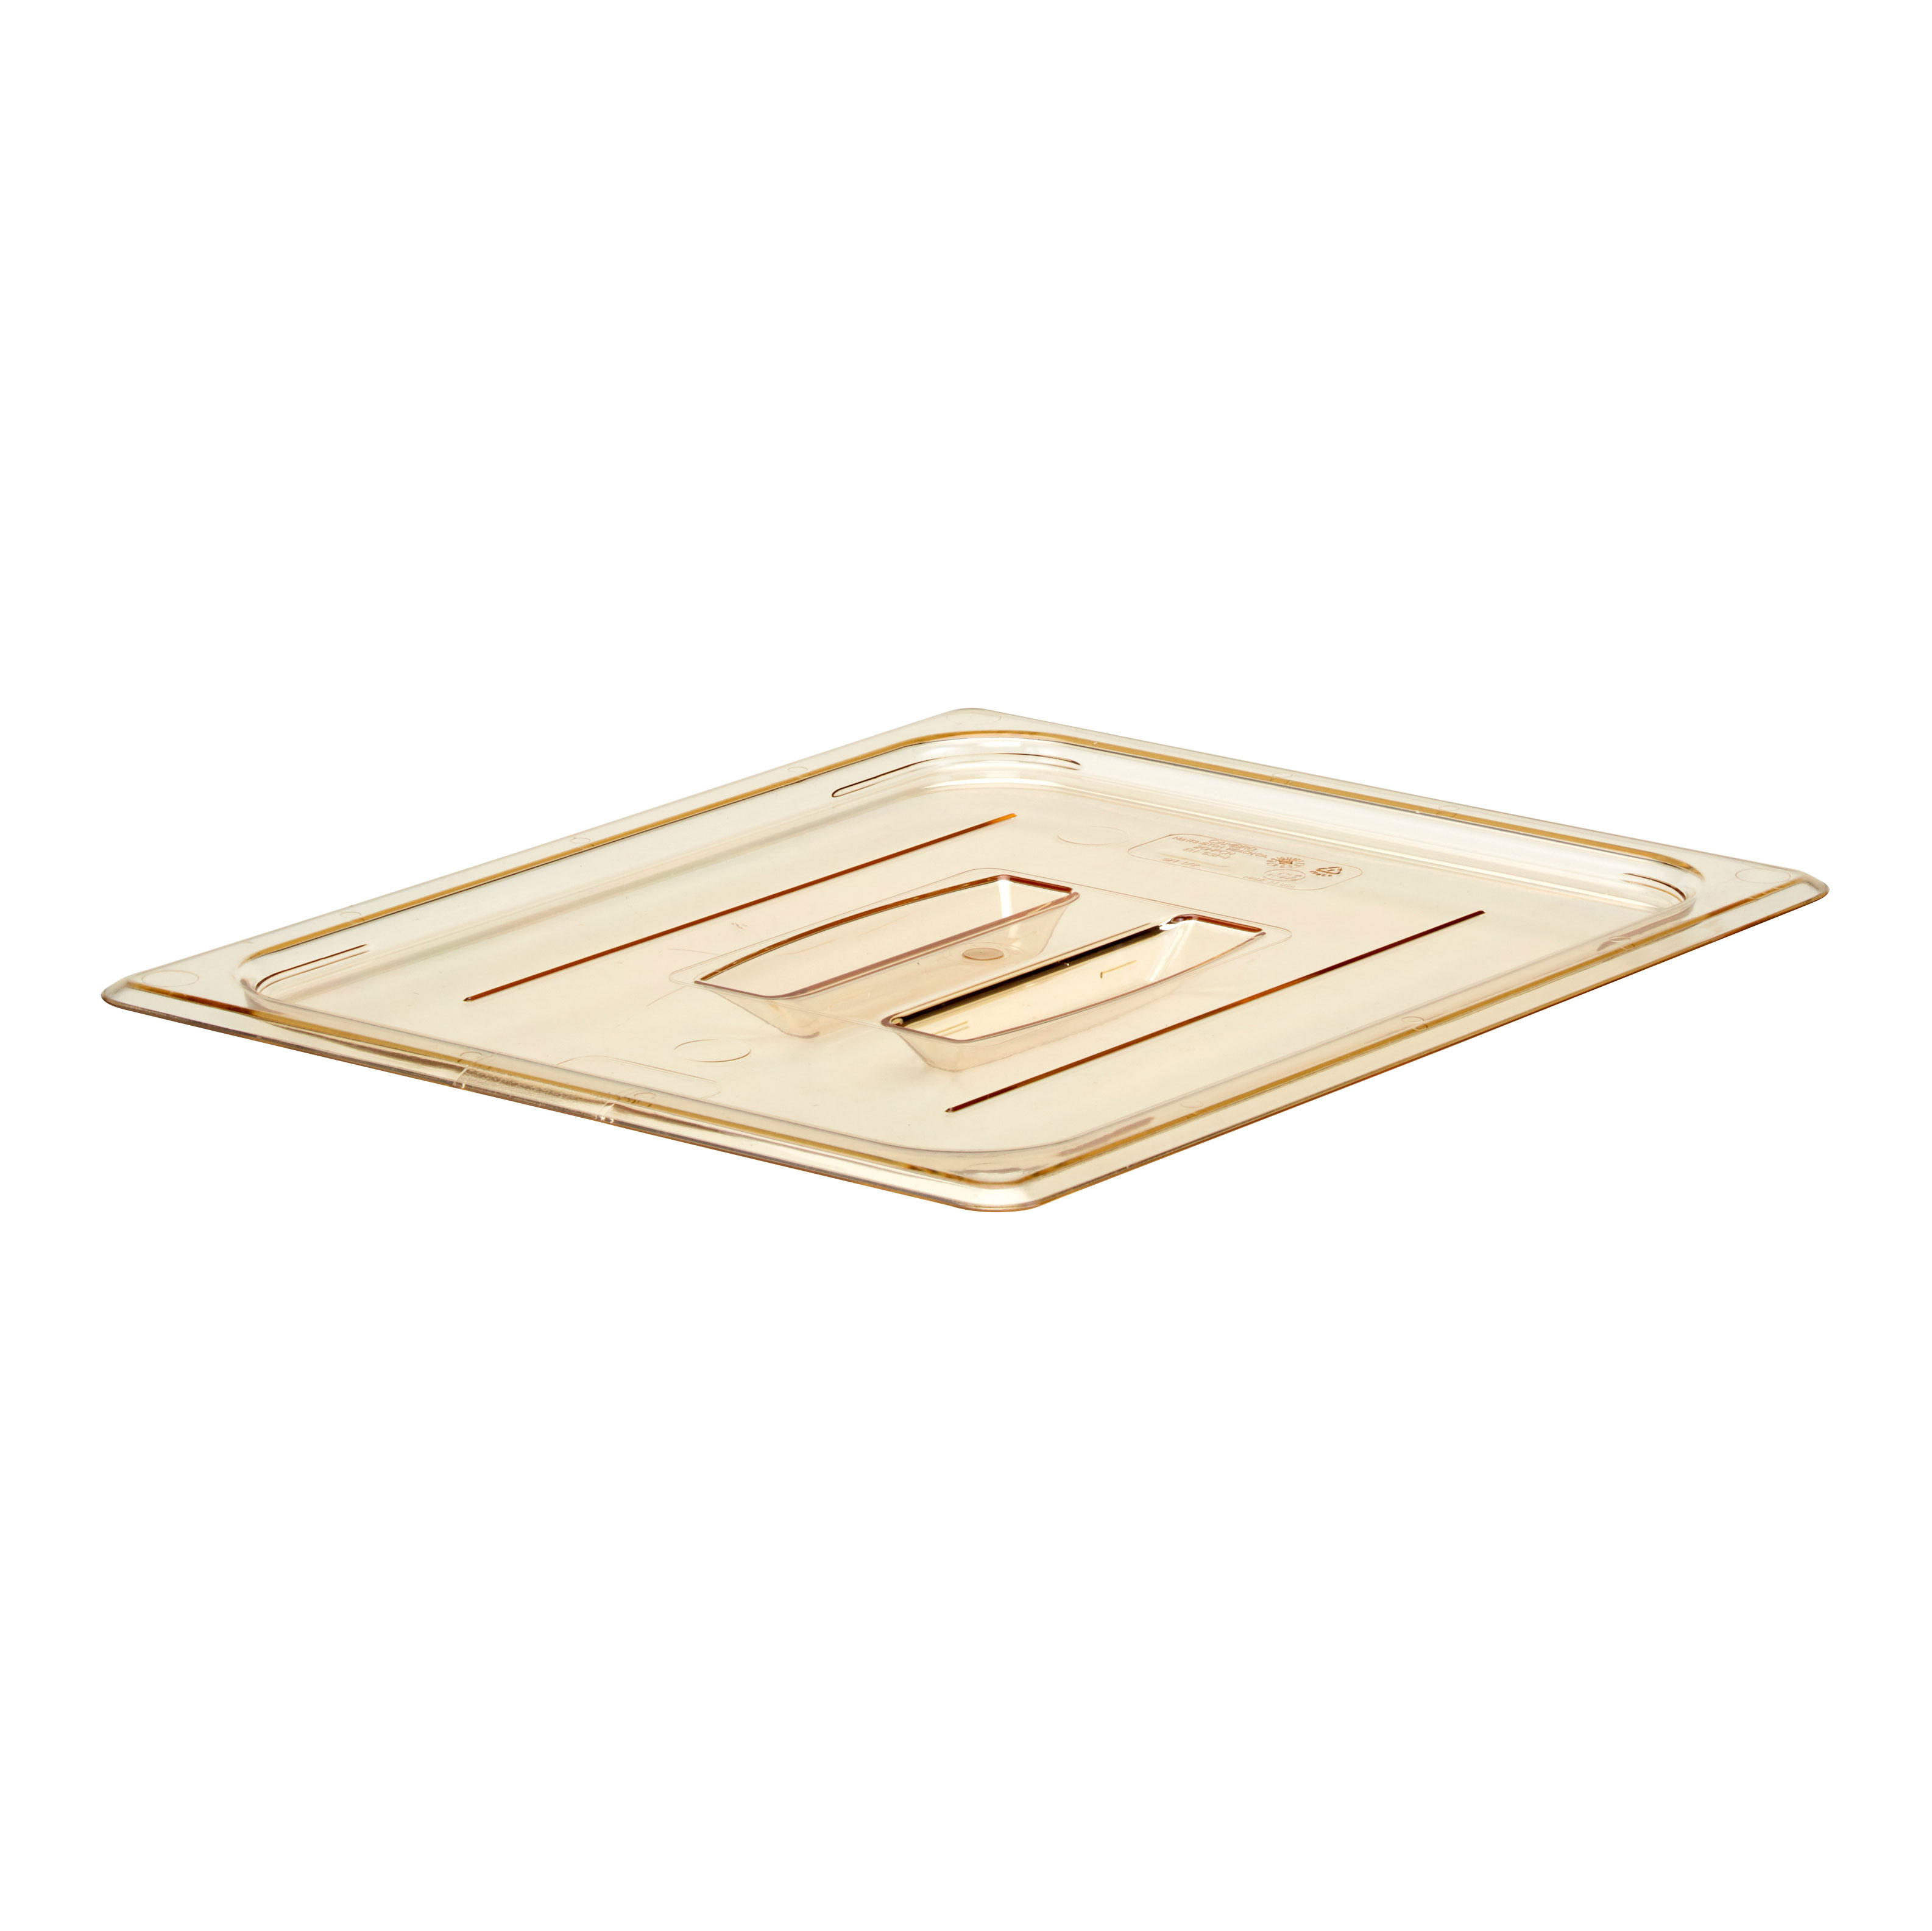 2410-119 Cambro 20HPCH150 food pan cover, hi-temp plastic